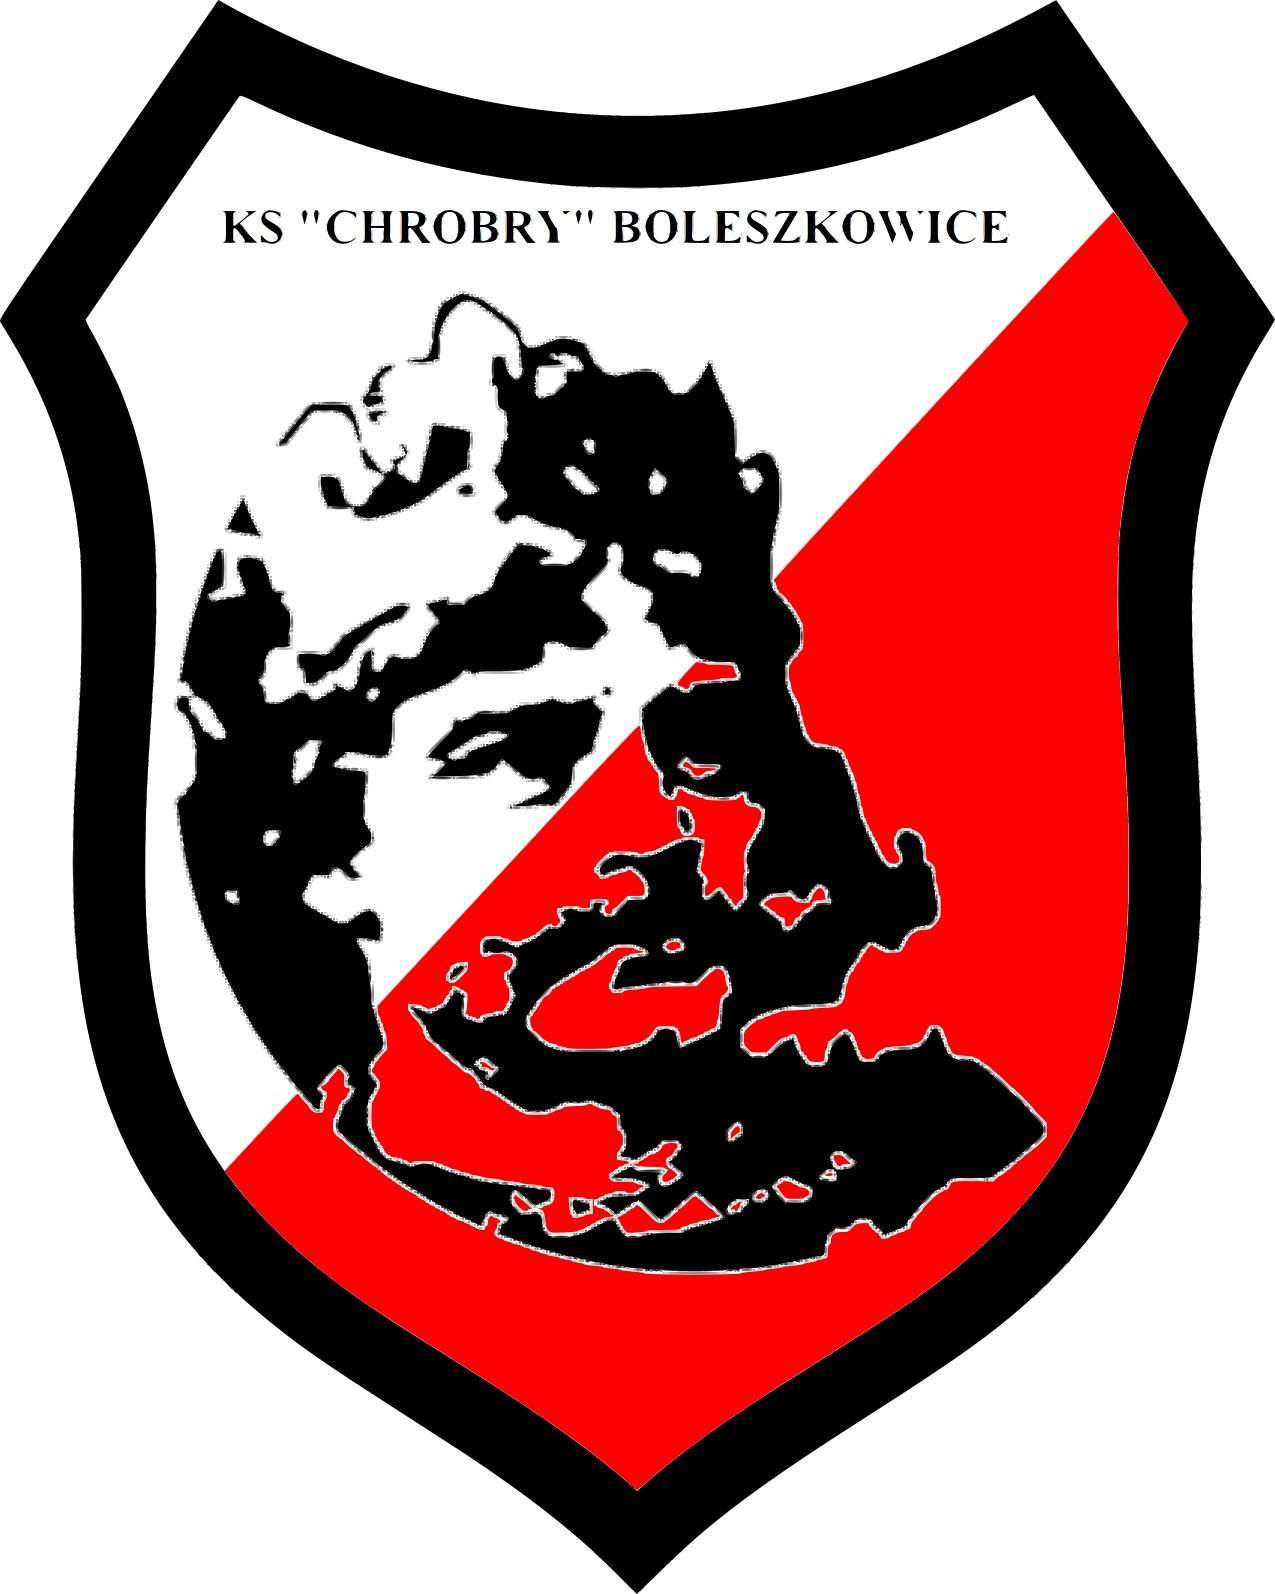 CHROBRY Boleszkowice